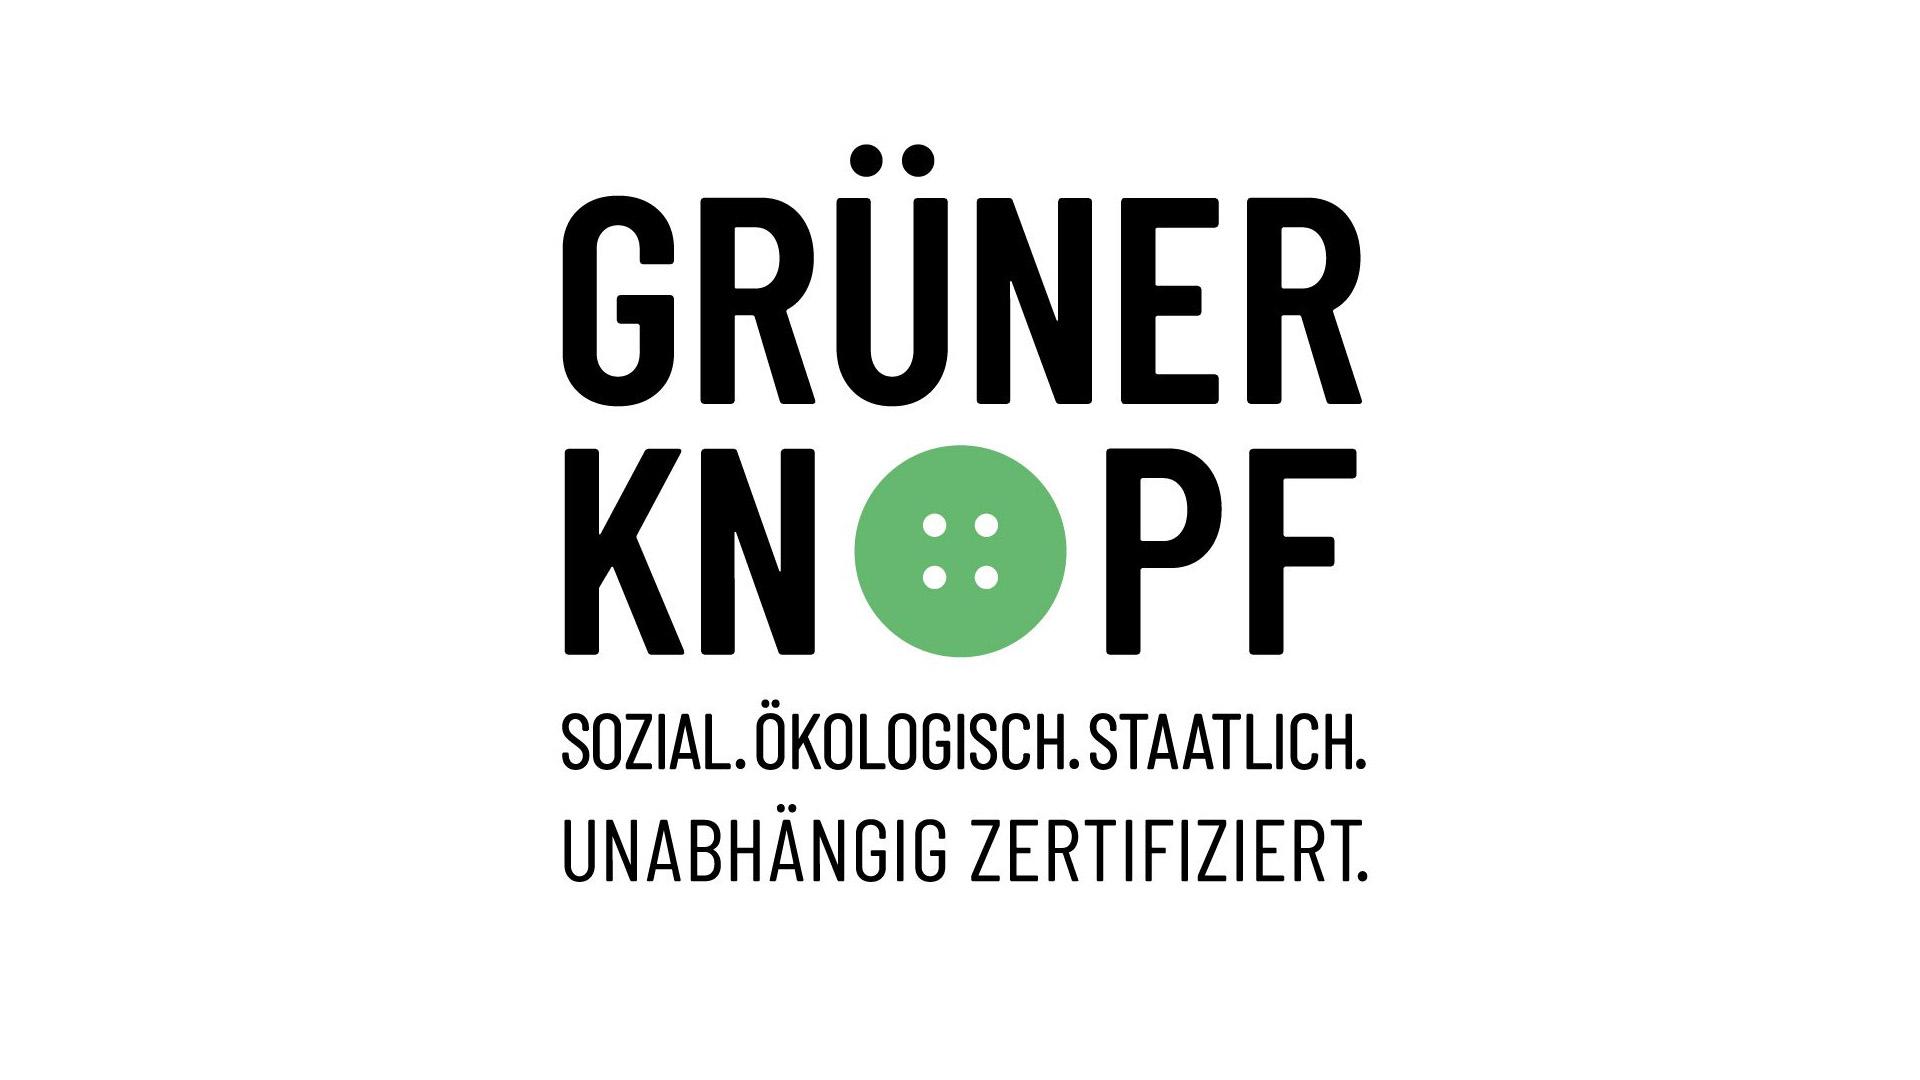 19kw37_GIZ_Gruener-Knopf_Logo_rgb